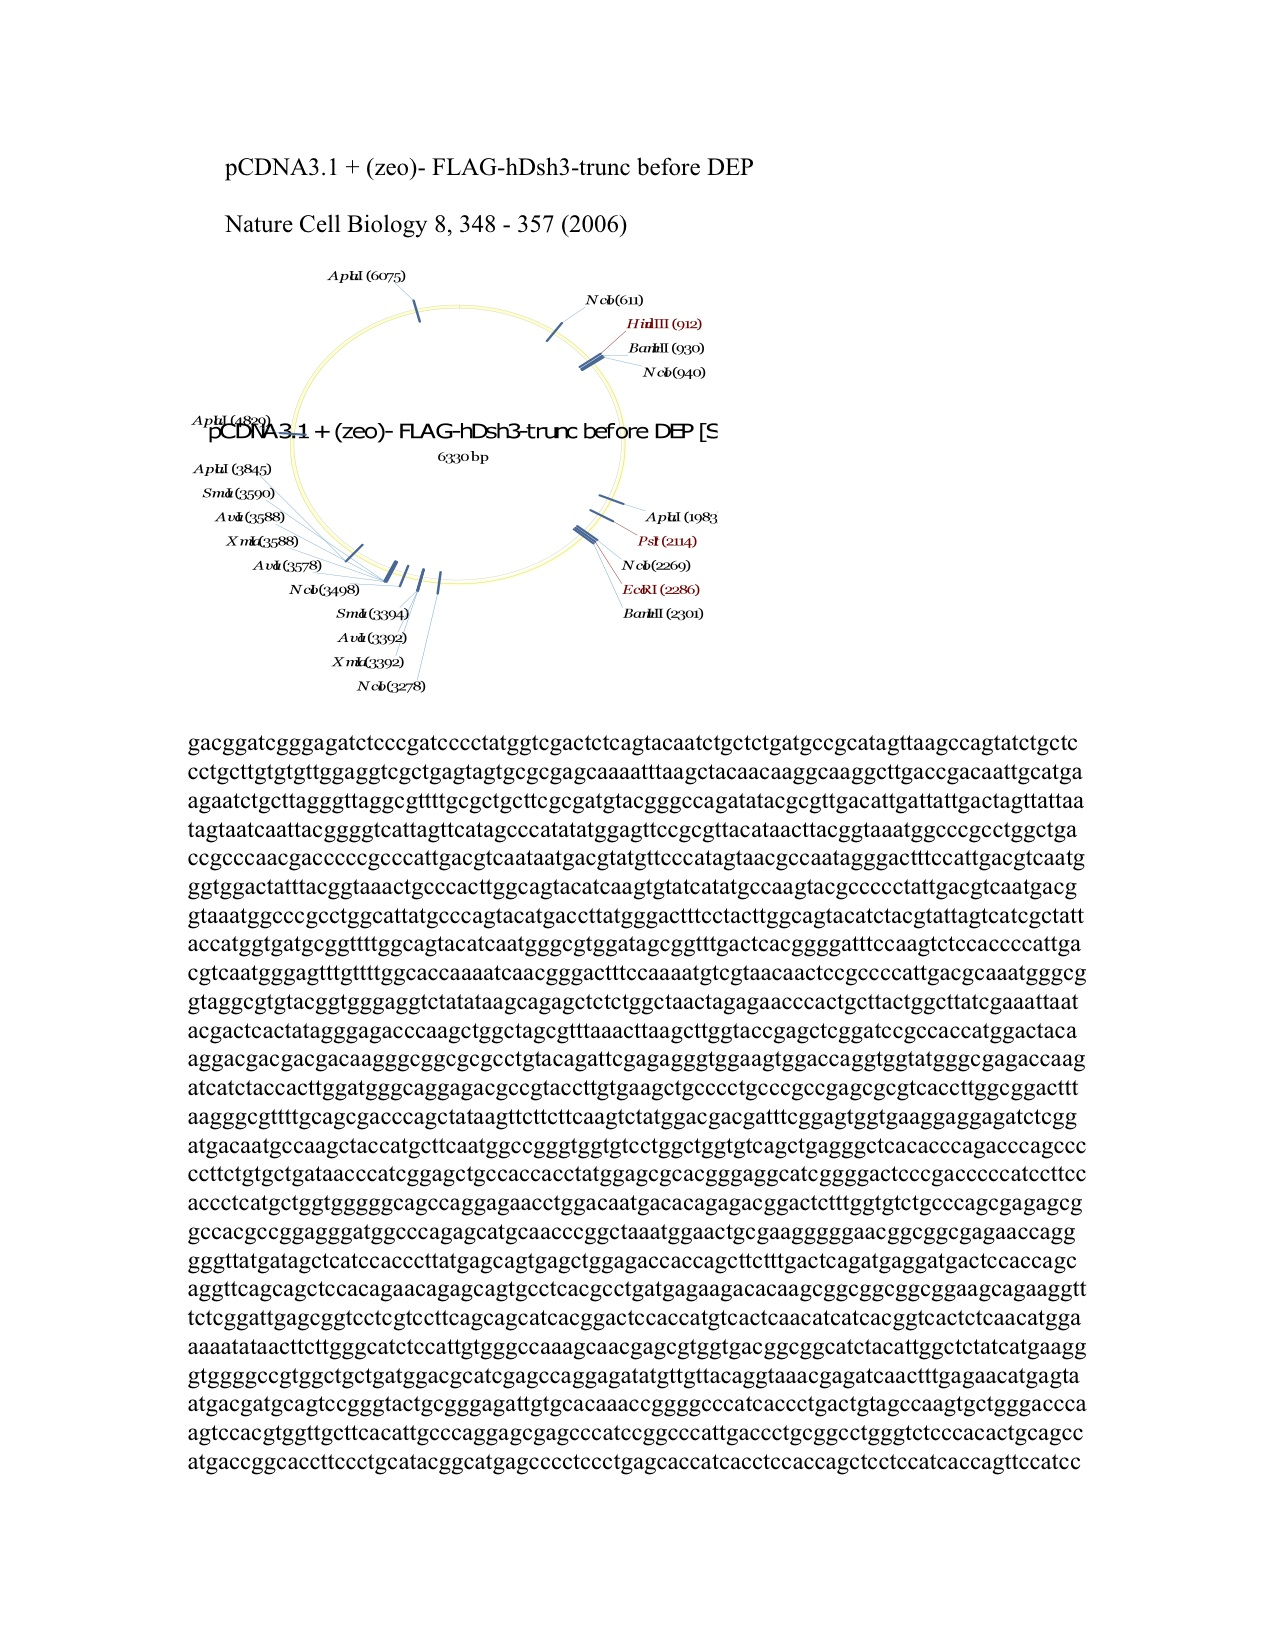 pcdna3 1 myc his pdf